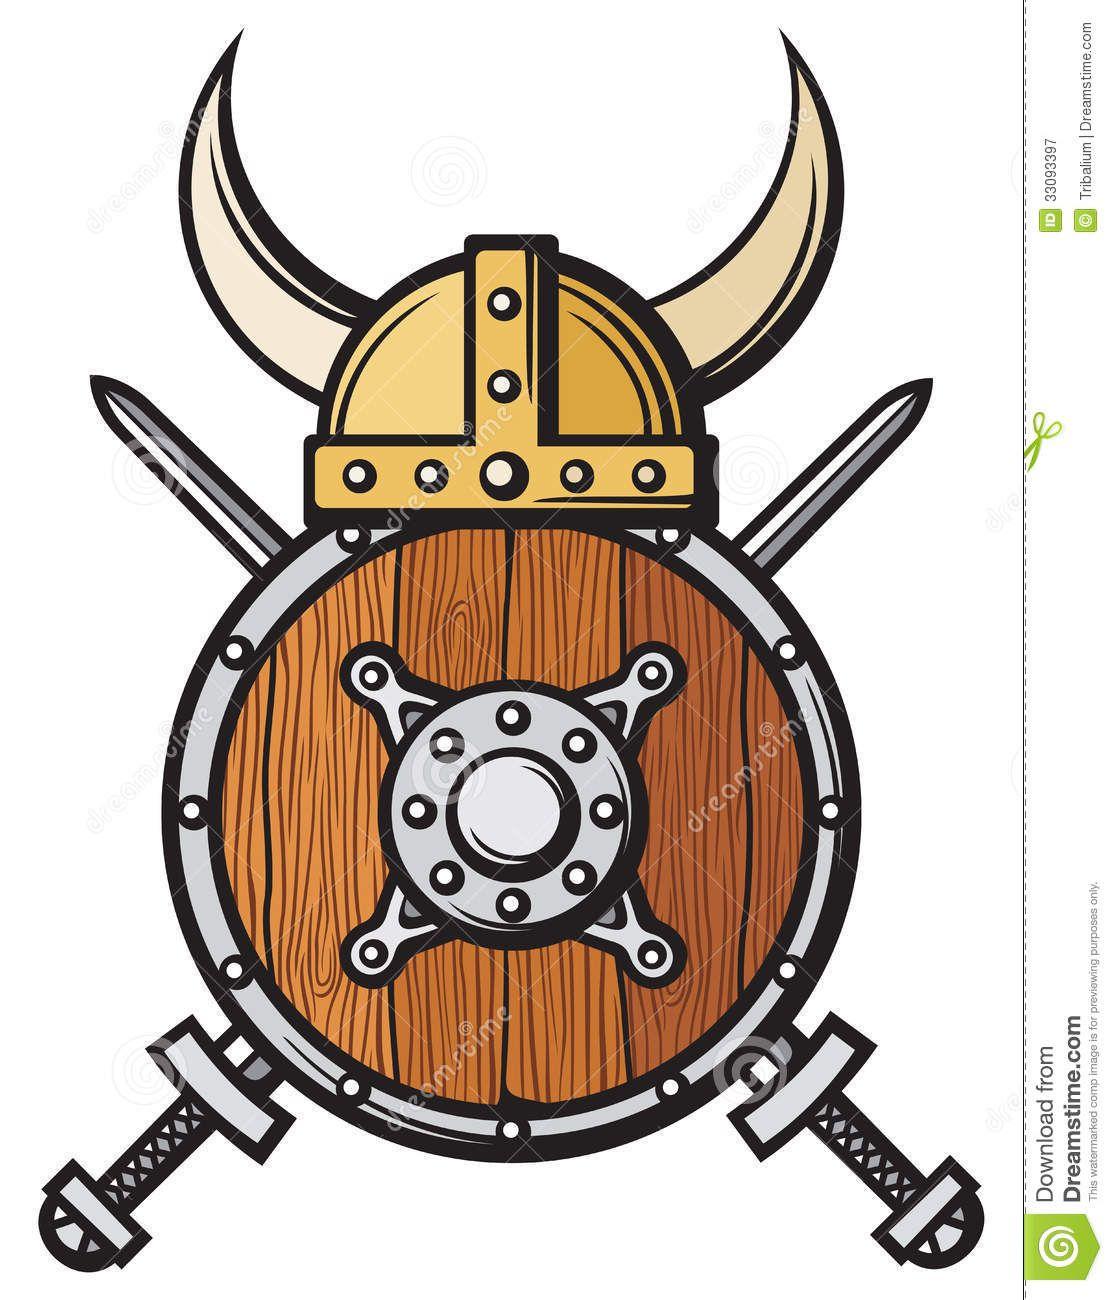 medium resolution of viking helmet royalty free stock photography image 33093397